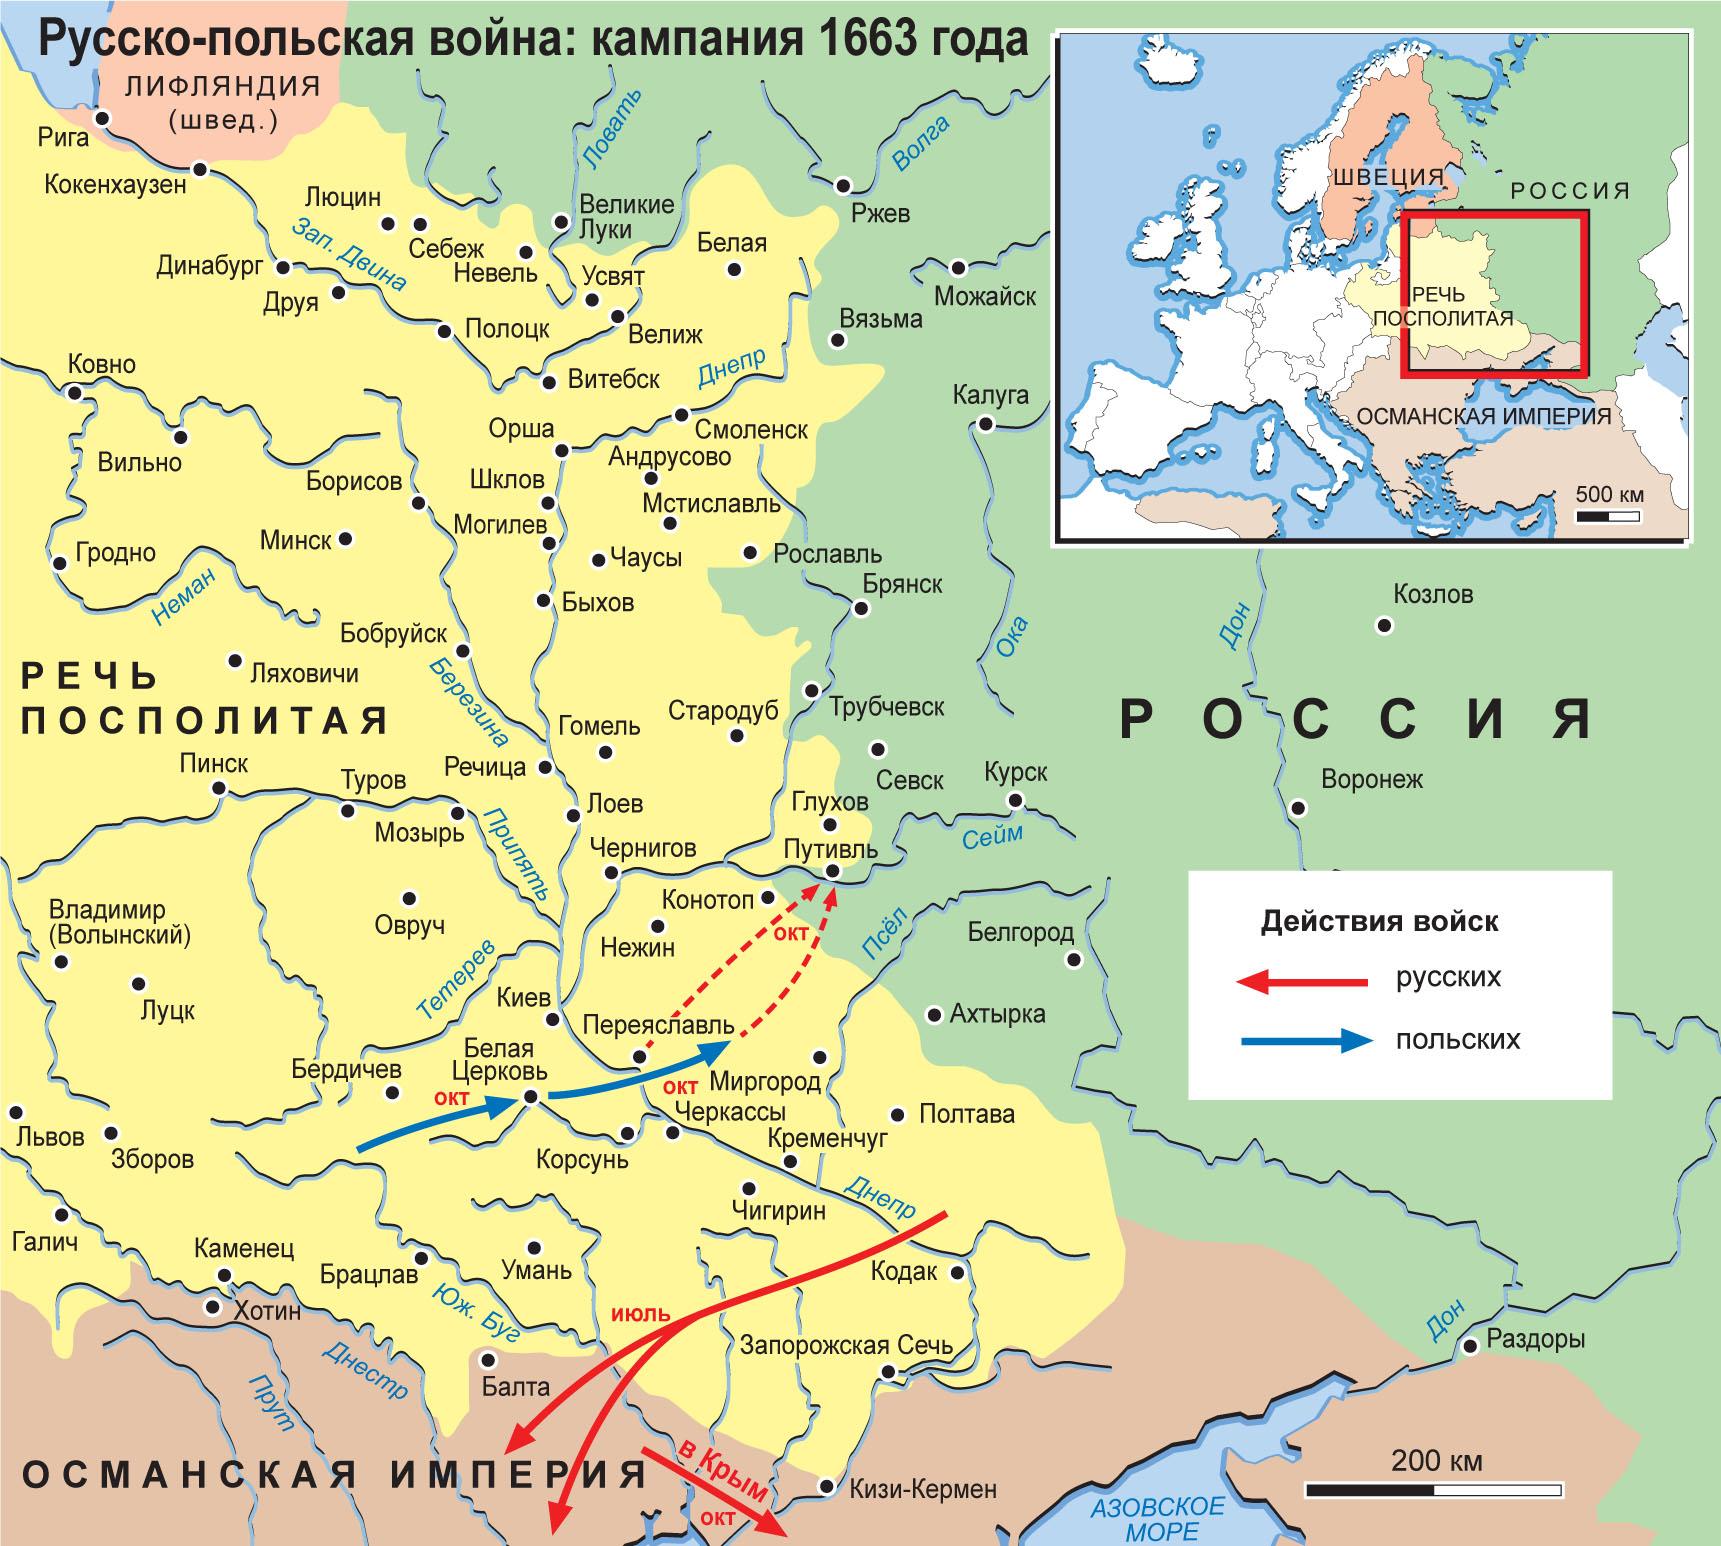 Новая страница (1): http://www.runivers.ru/vh/polskaya_1663.php